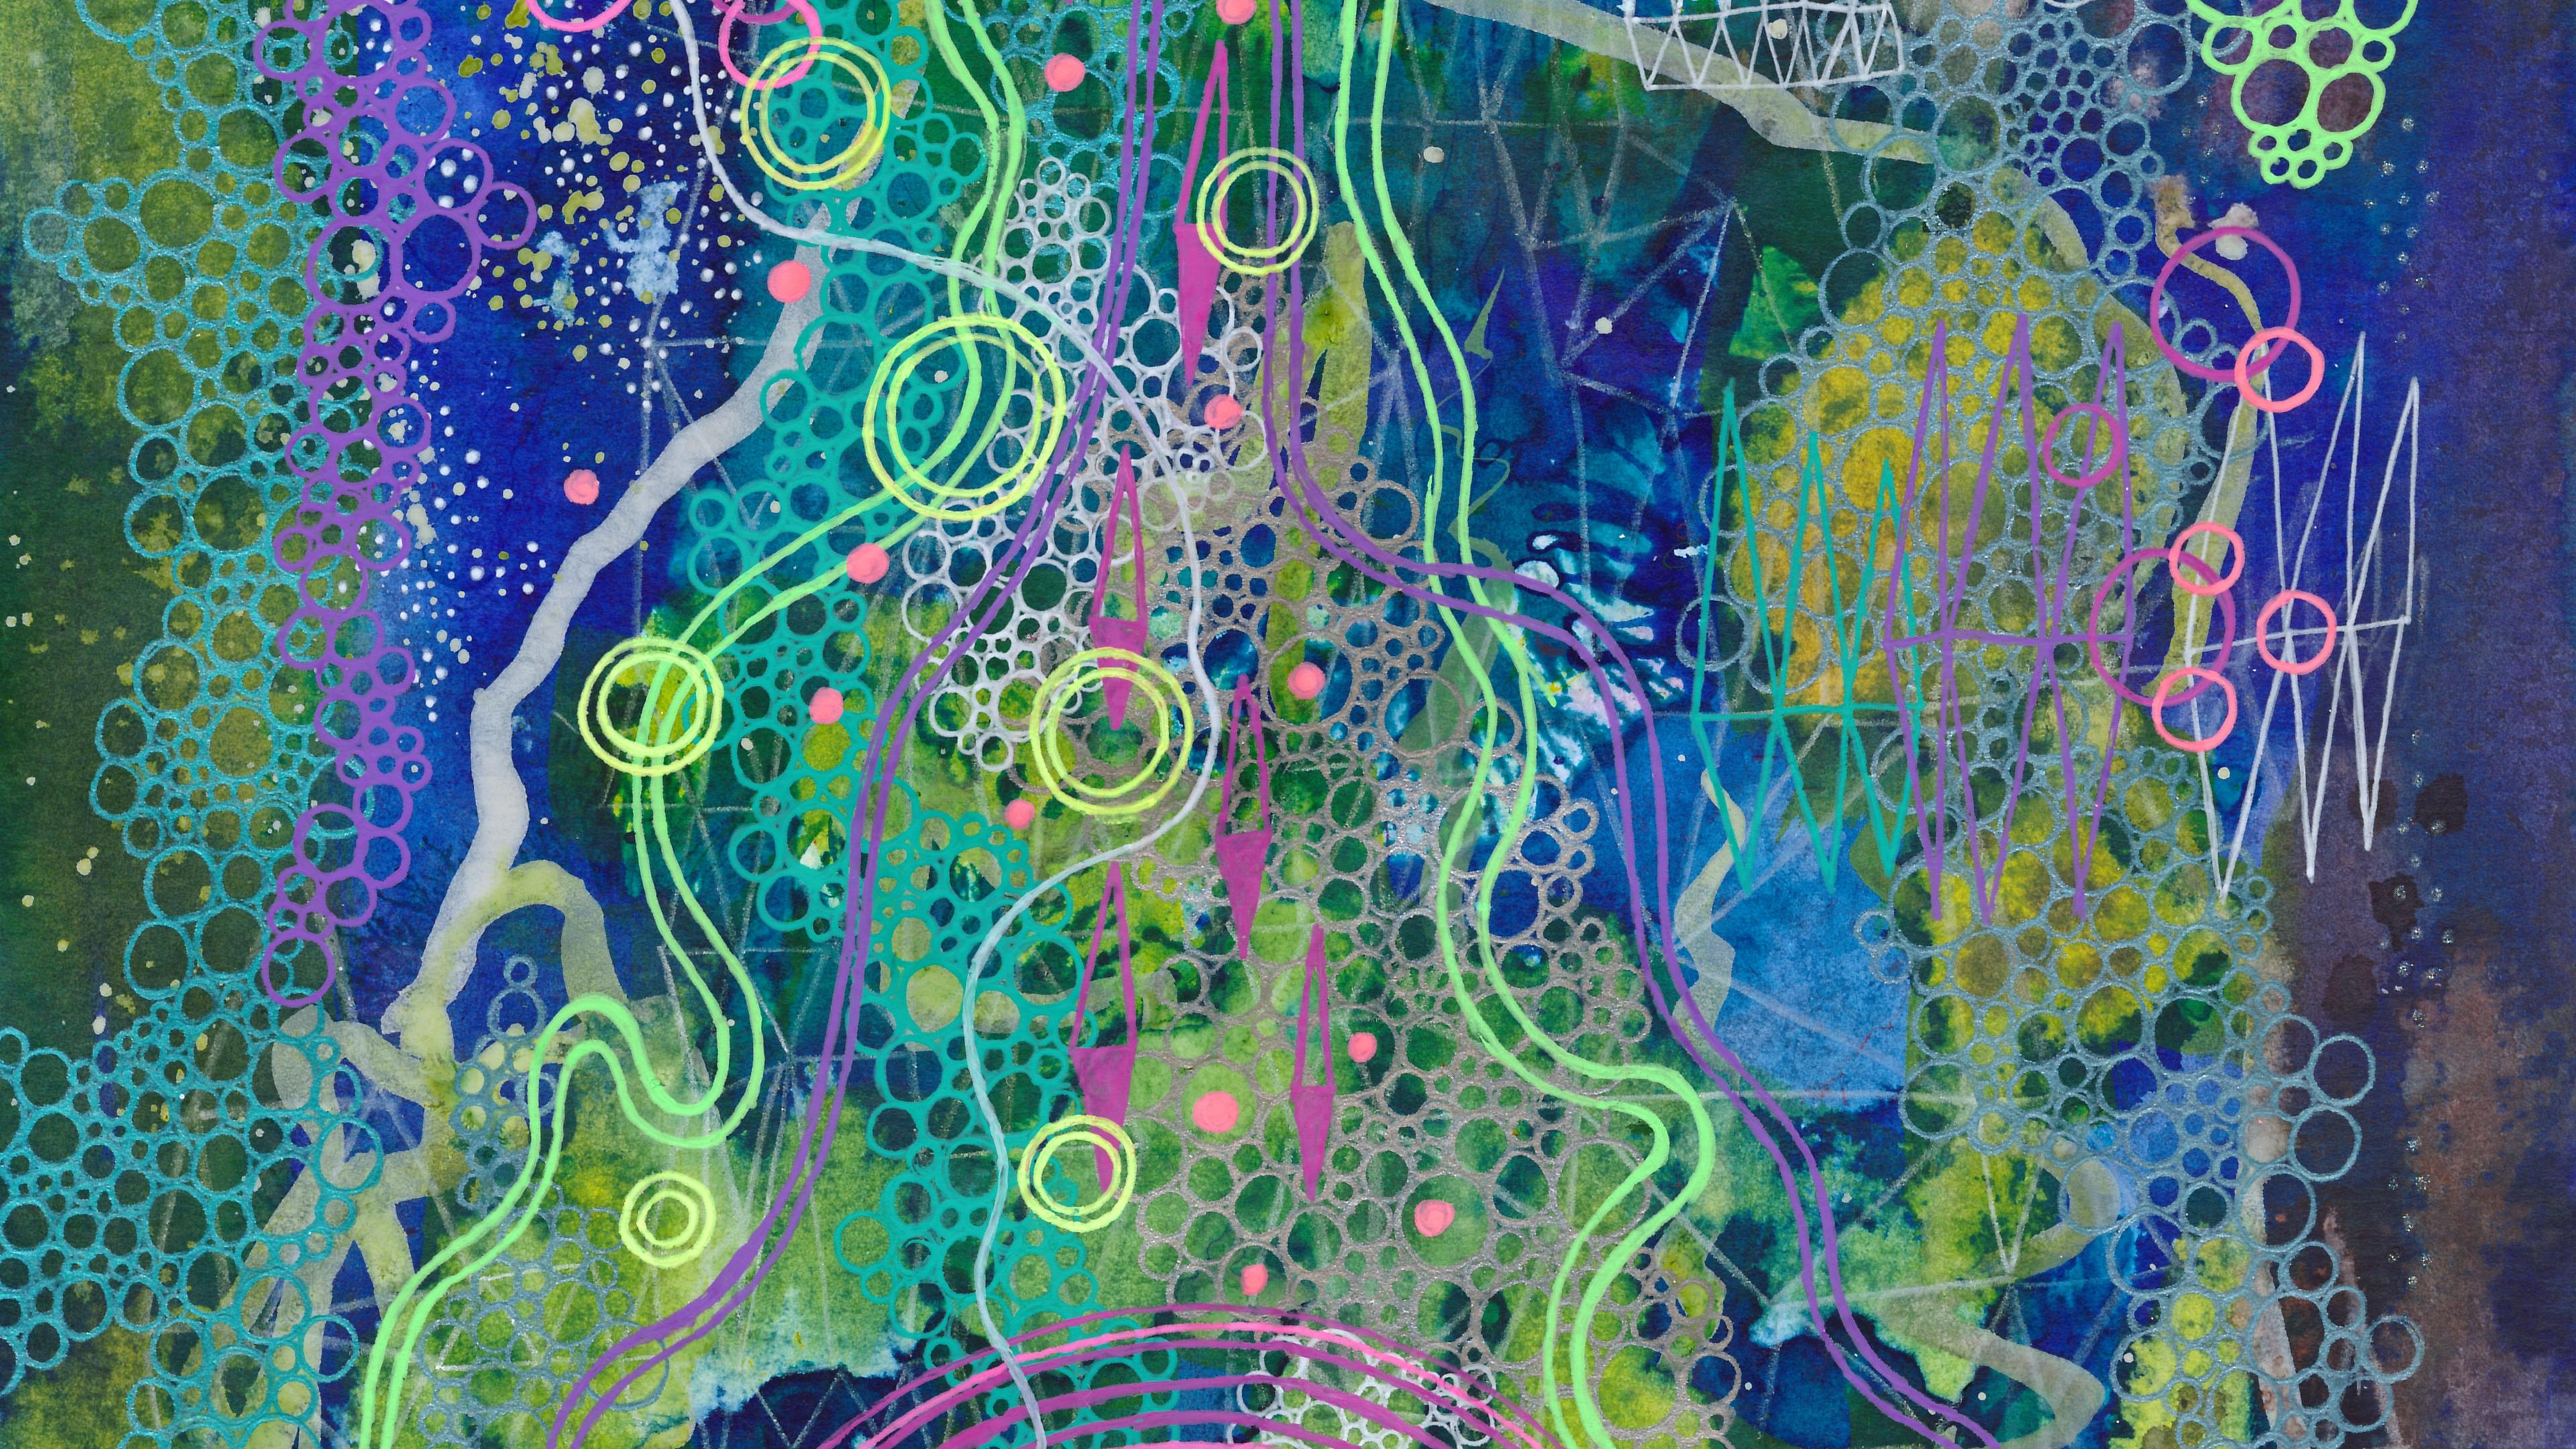 paint patterns spots circles abstraction 4k 1539369882 - paint, patterns, spots, circles, abstraction 4k - spots, patterns, Paint